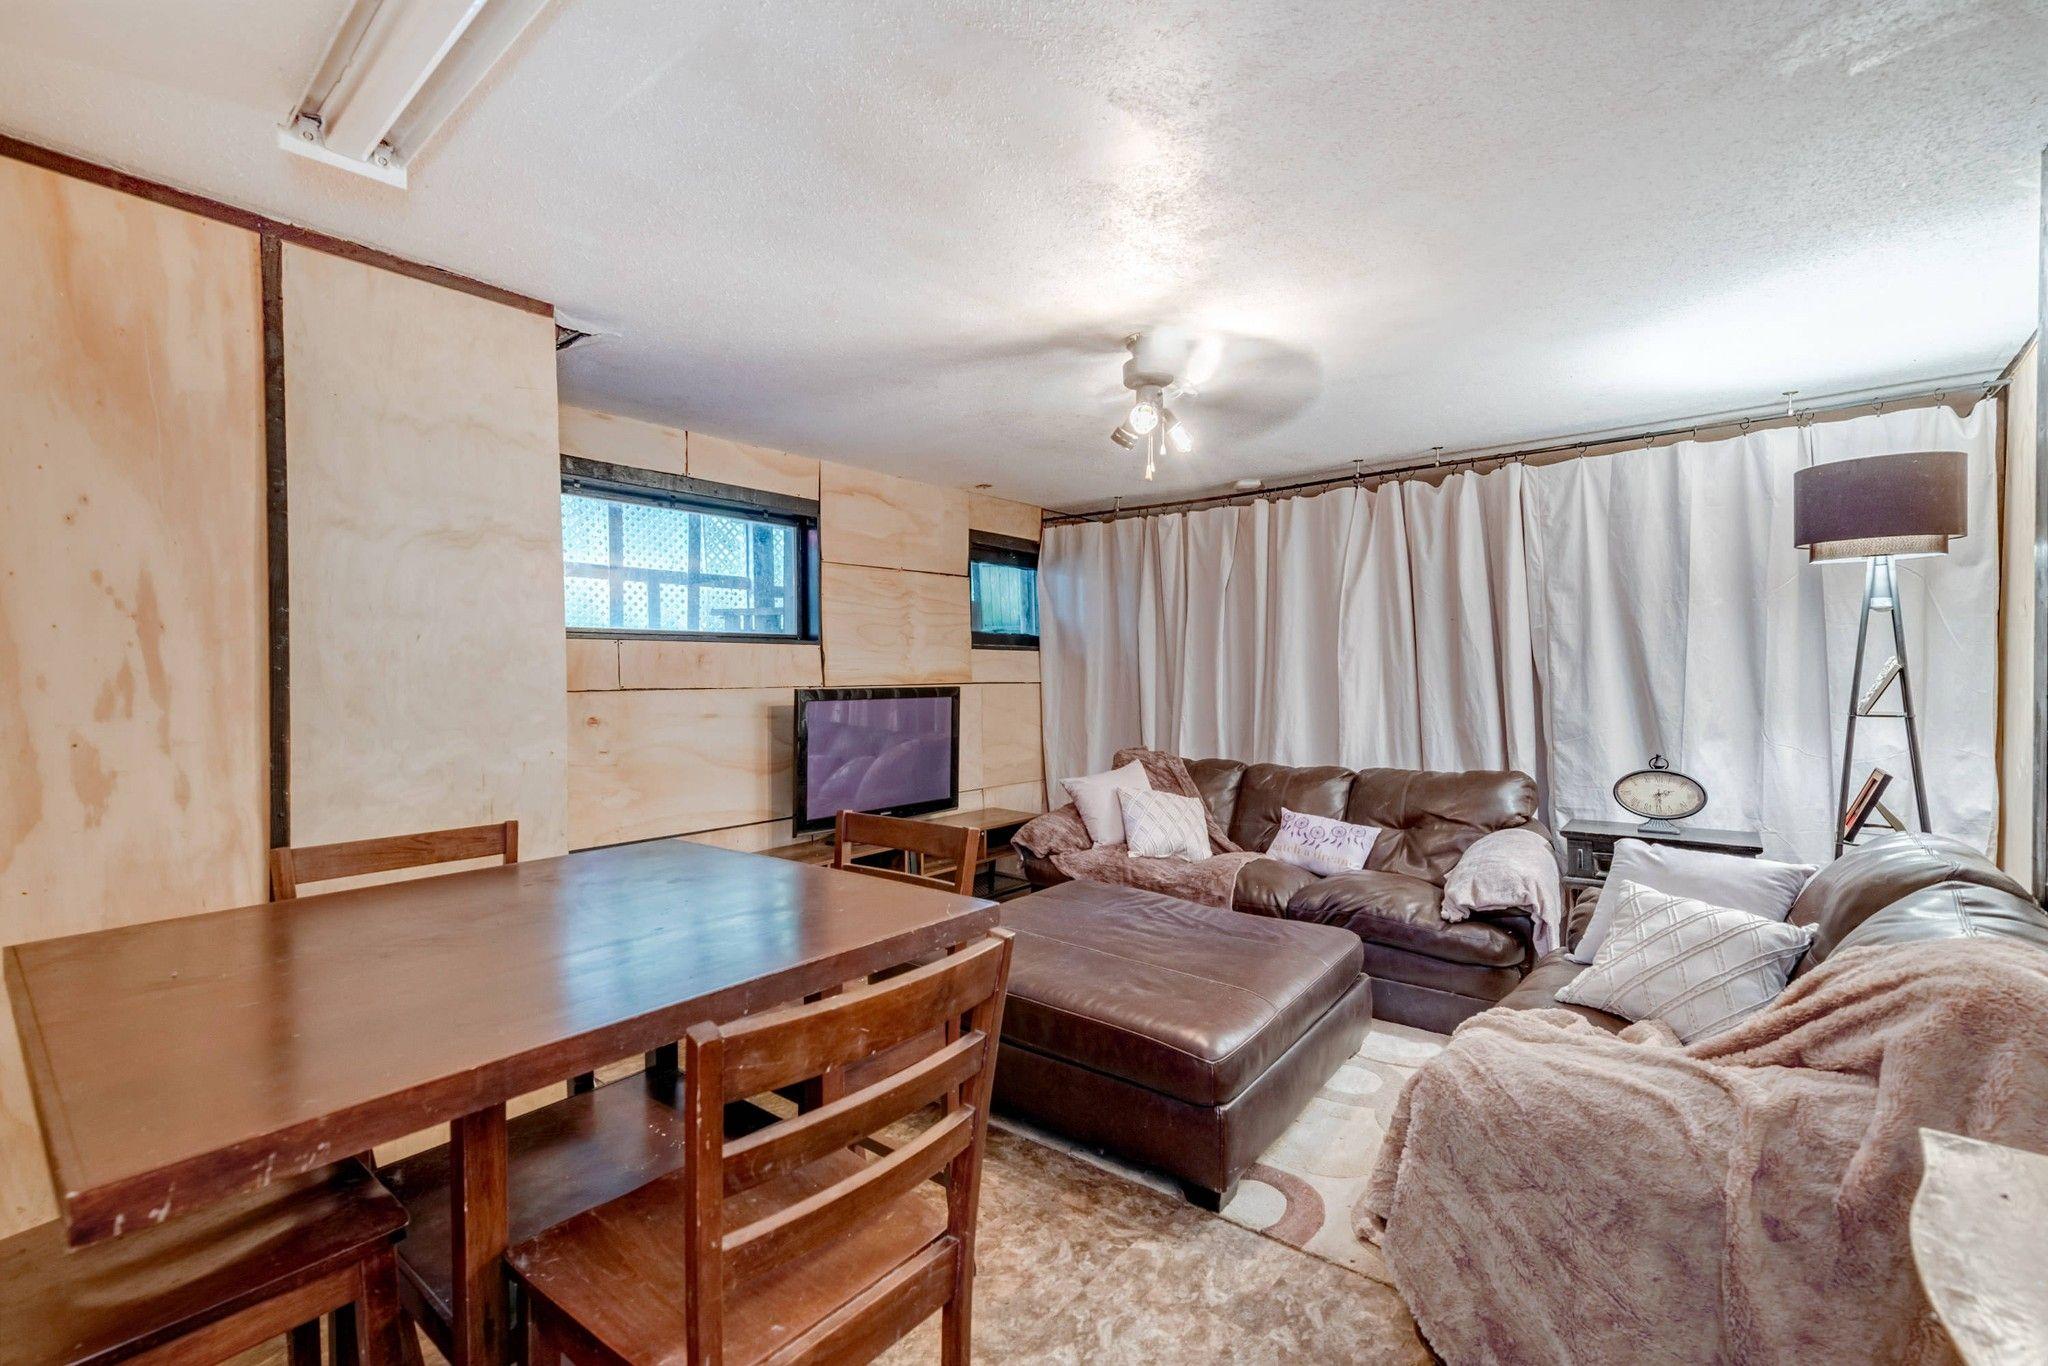 Photo 22: Photos: 20623 114 Avenue in Maple Ridge: Southwest Maple Ridge House for sale : MLS®# R2465656